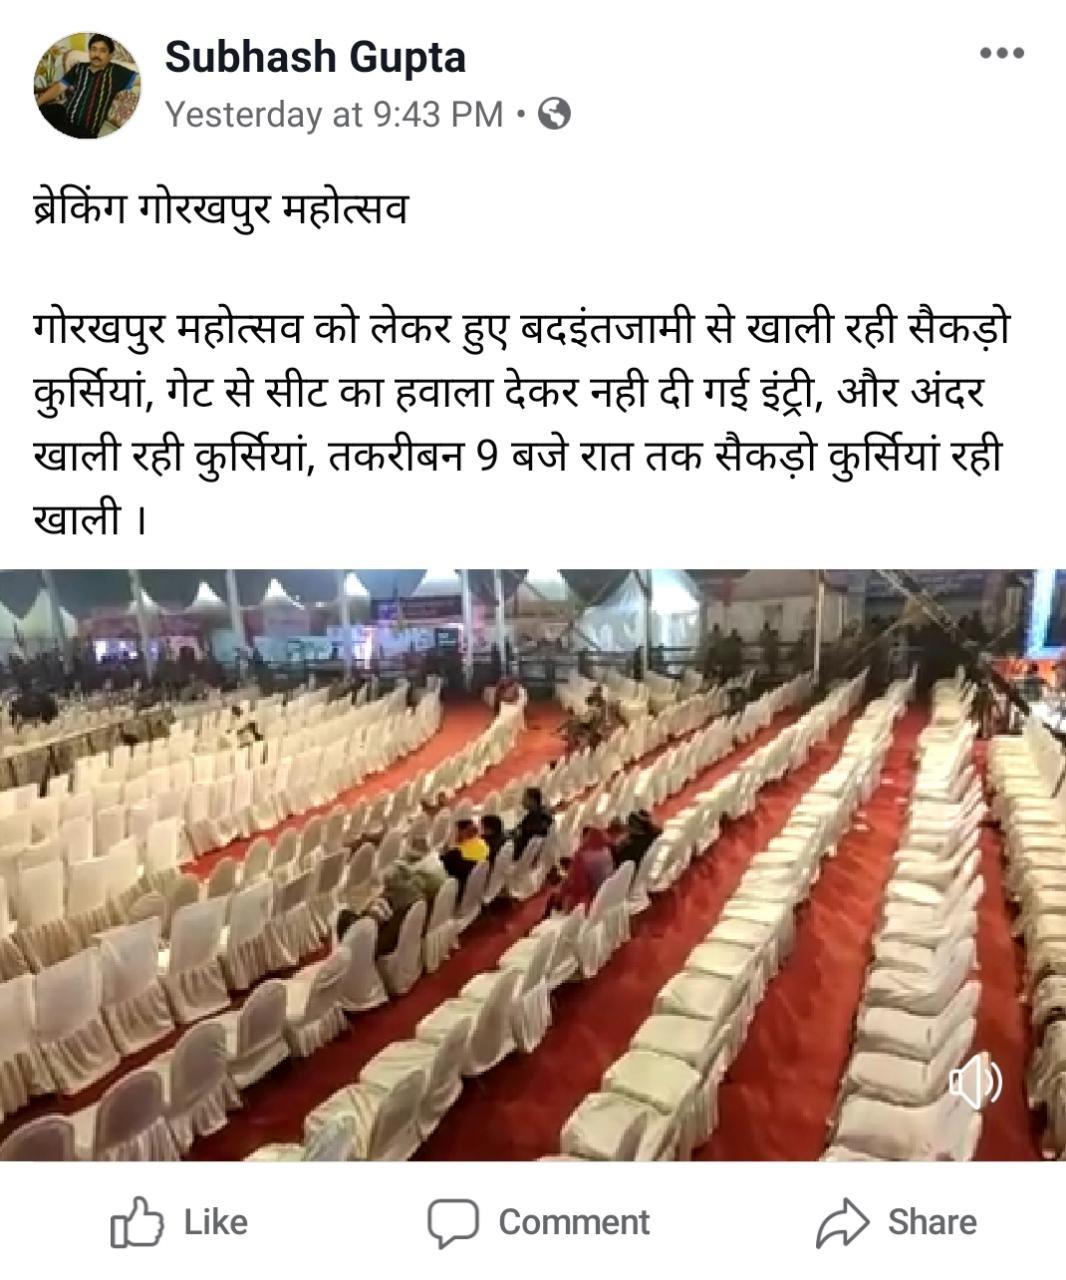 Gorakhpur Mahotsav Videos